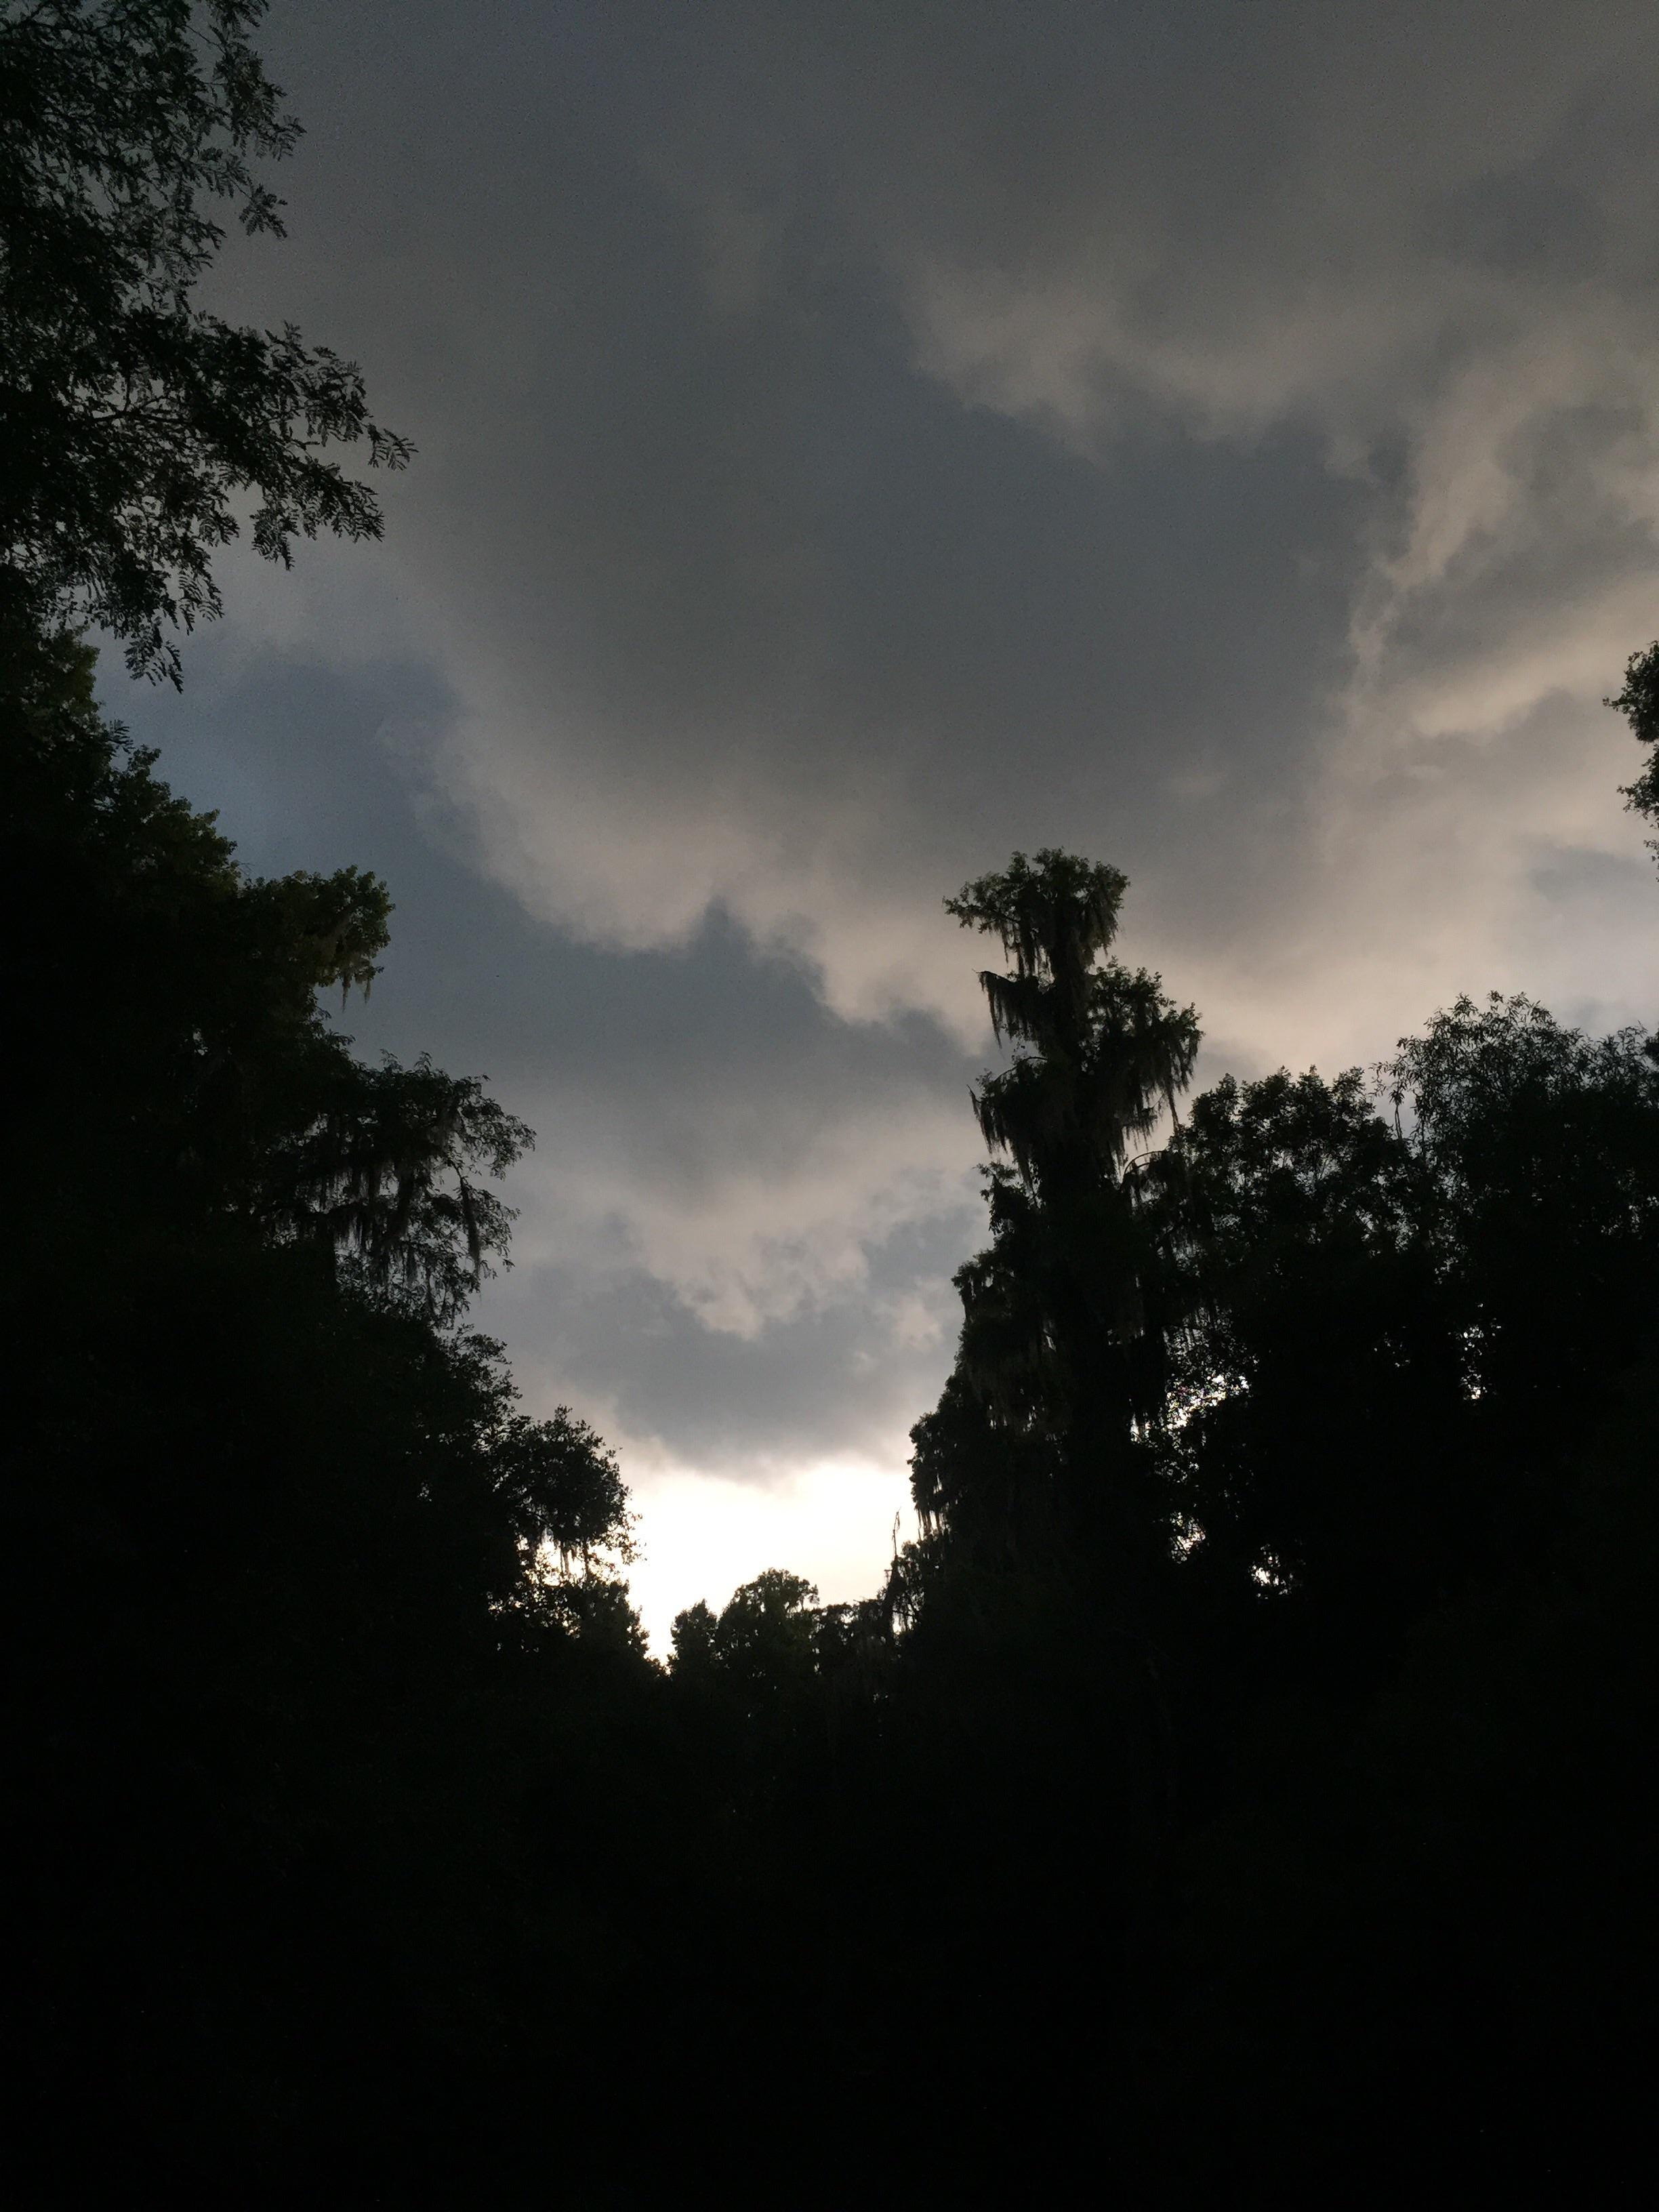 Ominous clouds.